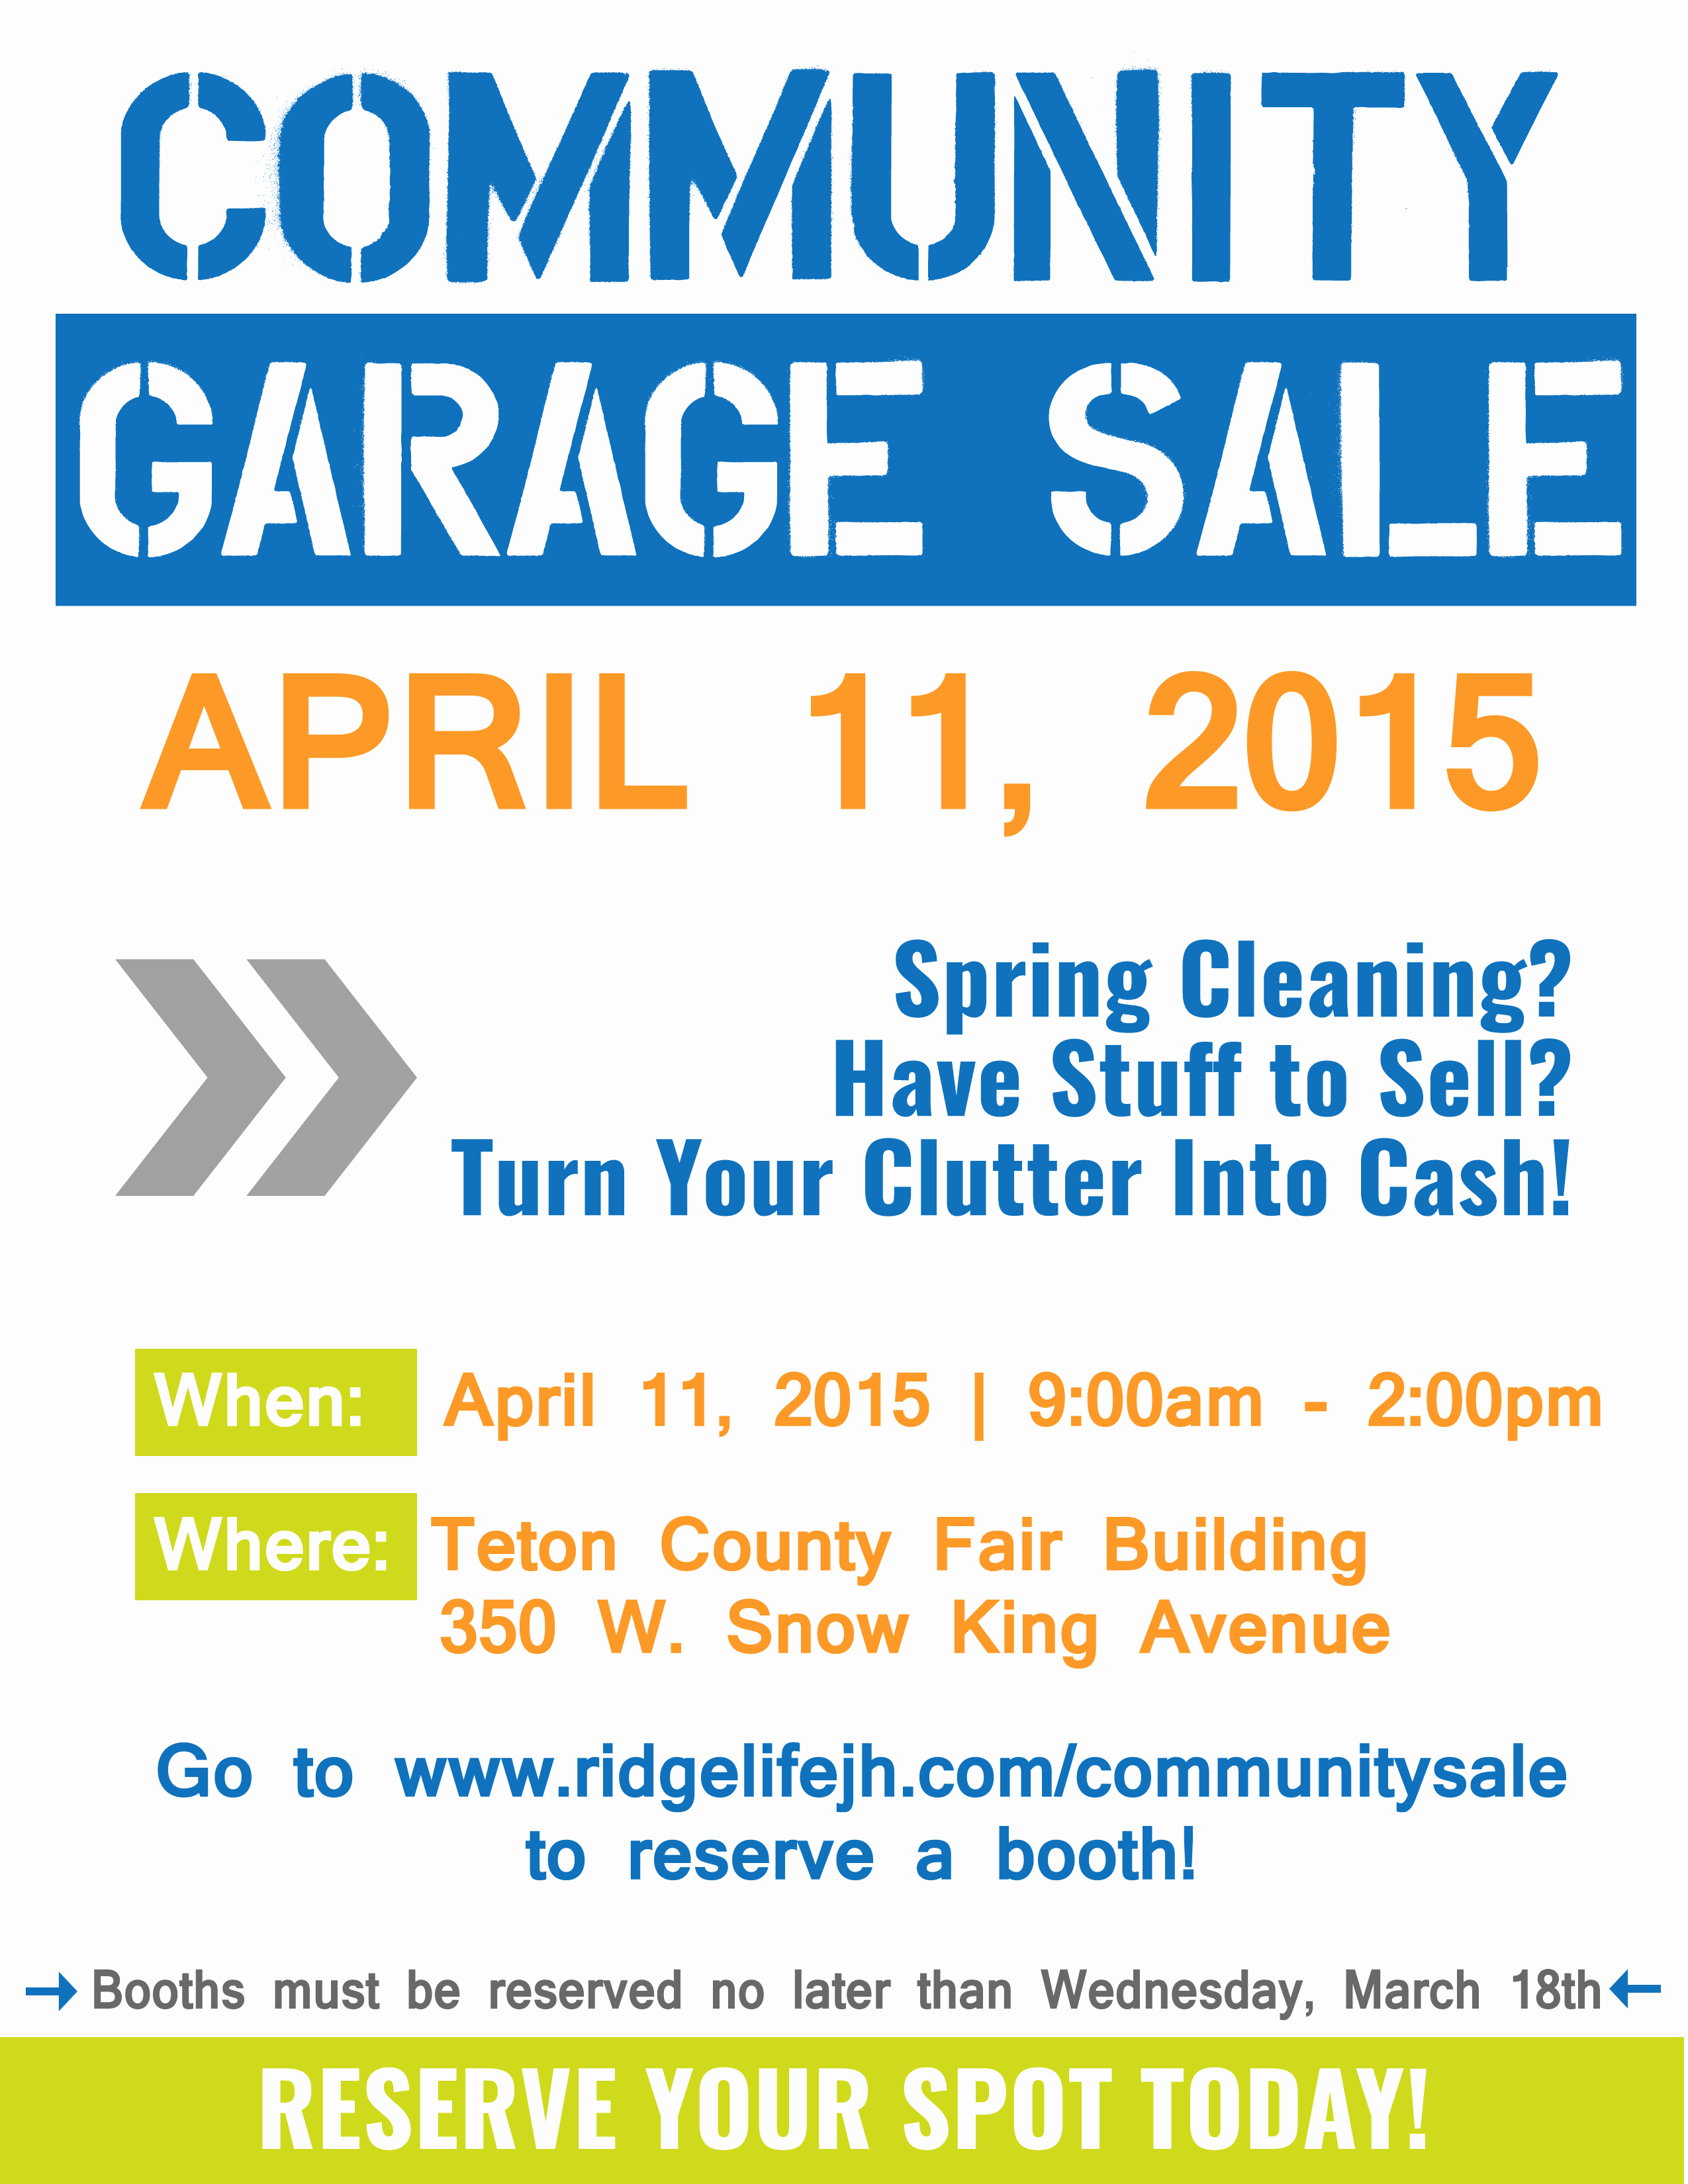 Garage Sale Flyer Template Lovely Munity Garage Sale – Ridgelife Church